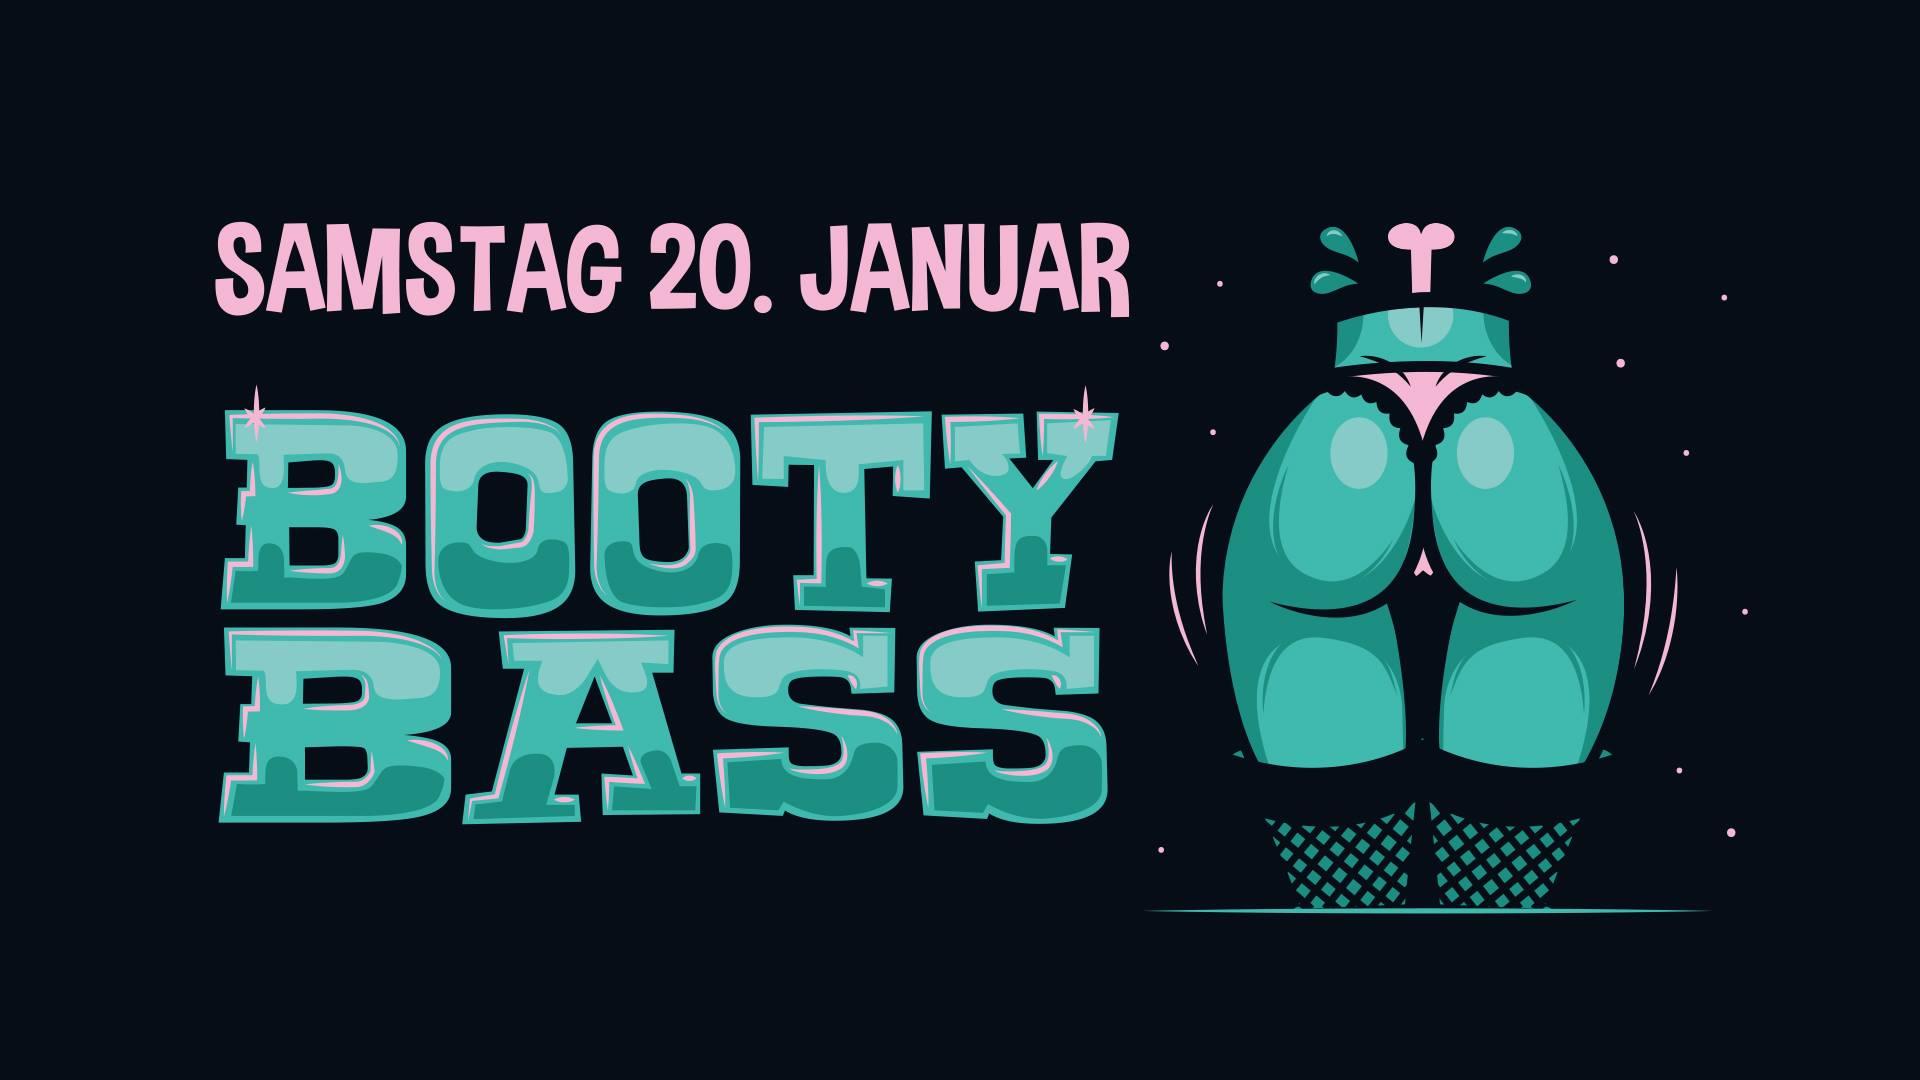 20.1.2017 - Booty Bass [Münster]